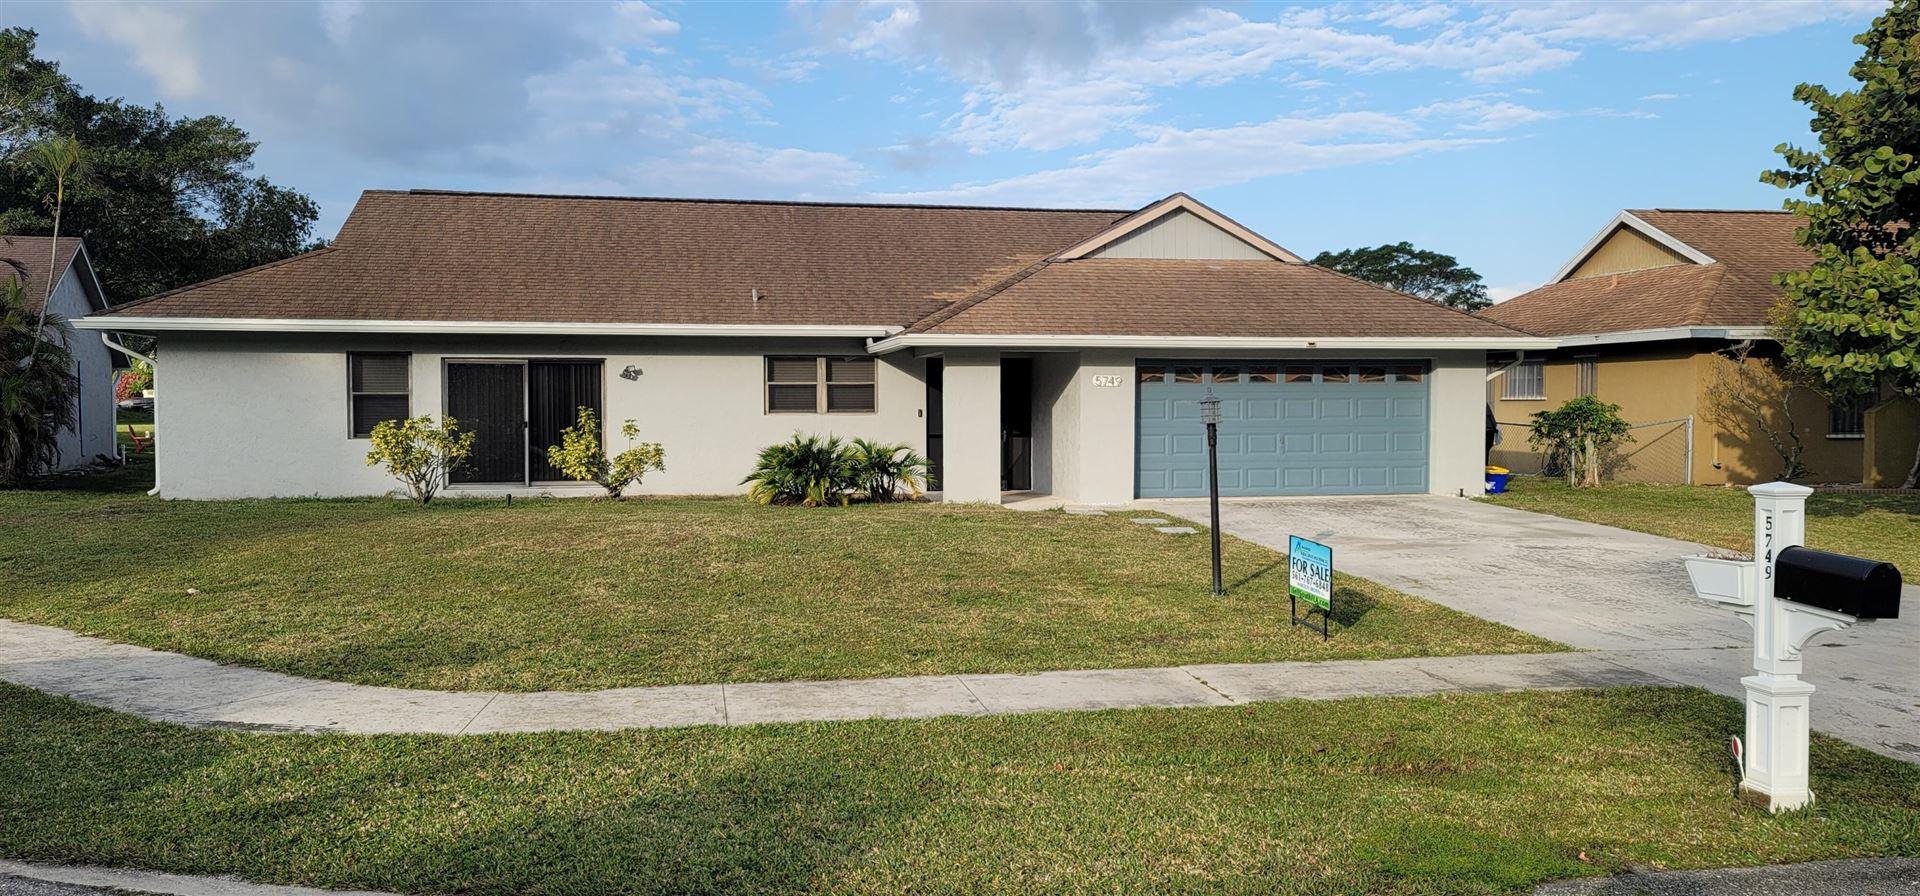 5749 Adair Way, Lake Worth, FL 33467 - #: RX-10683526